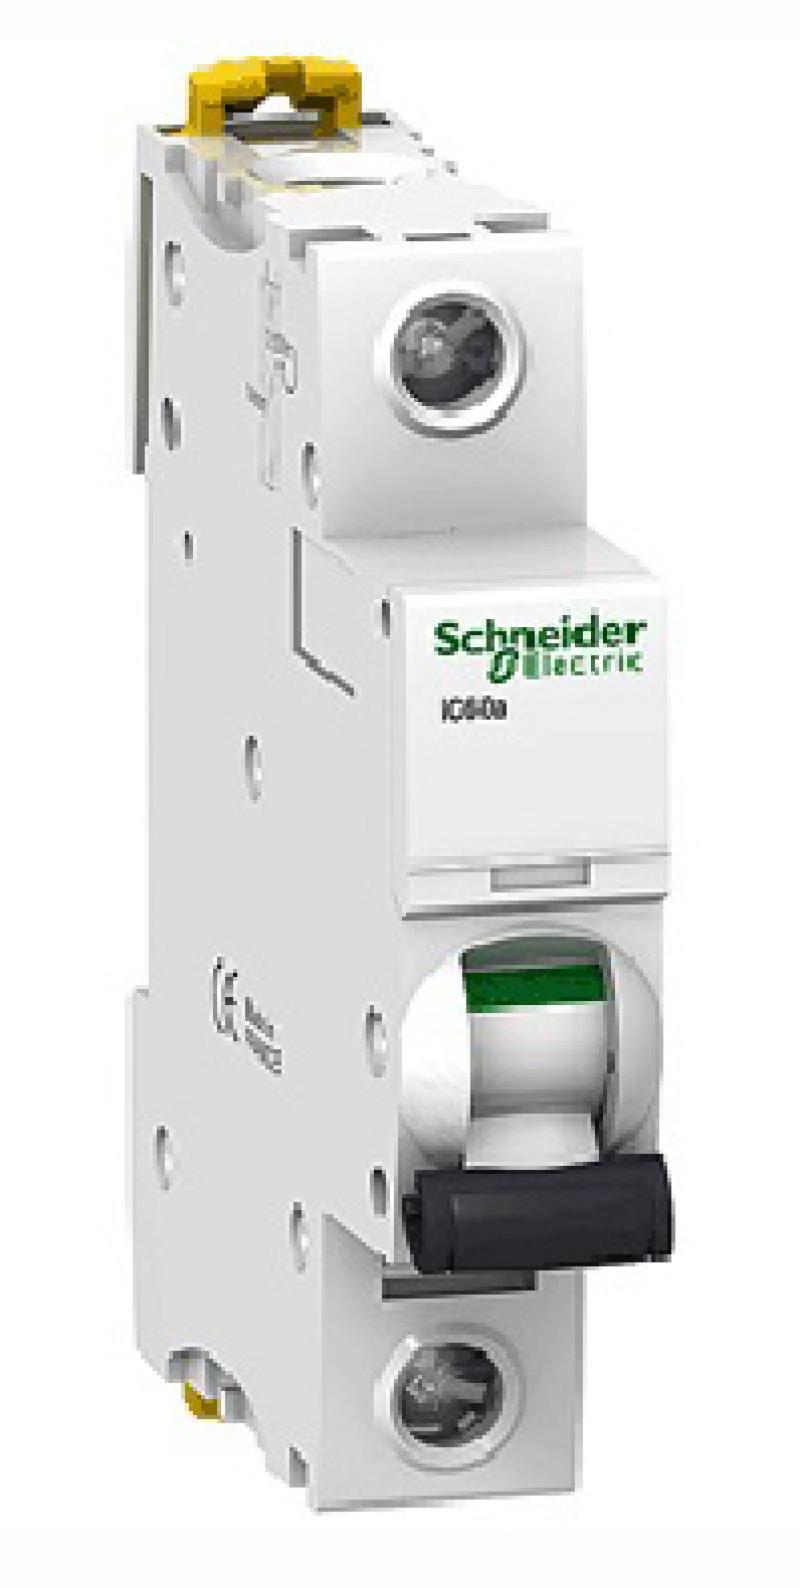 Автоматический выключатель Schneider Electric iC60N 1П 16A B A9F78116 панель лицевая schneider electric actassi 1 модуль белый 24 шт vdi88240